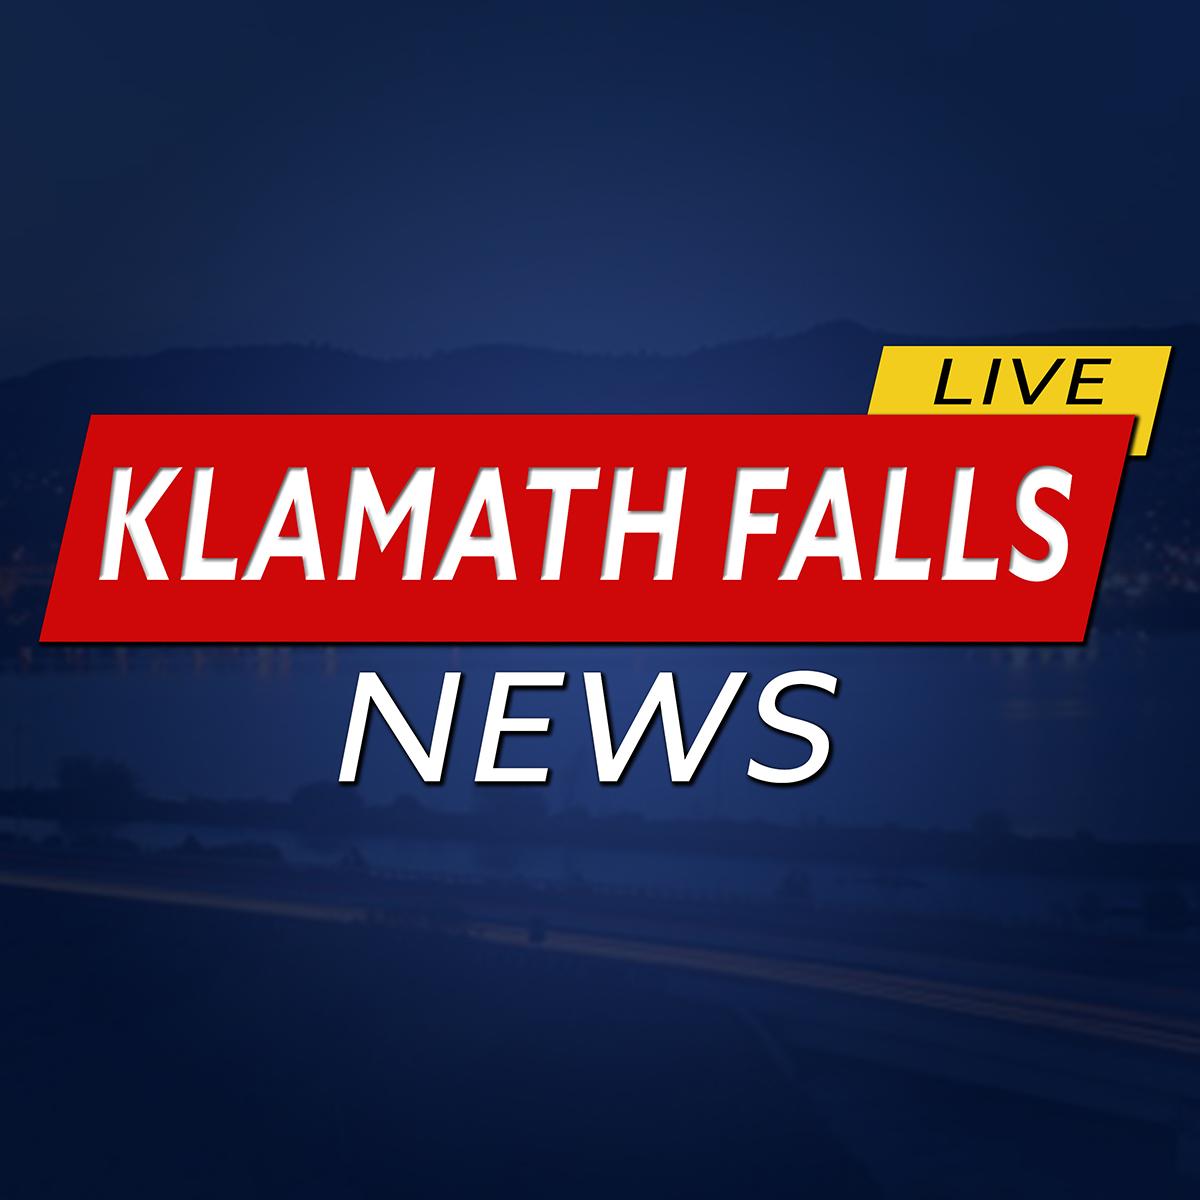 Klamath Falls News 1200.jpg